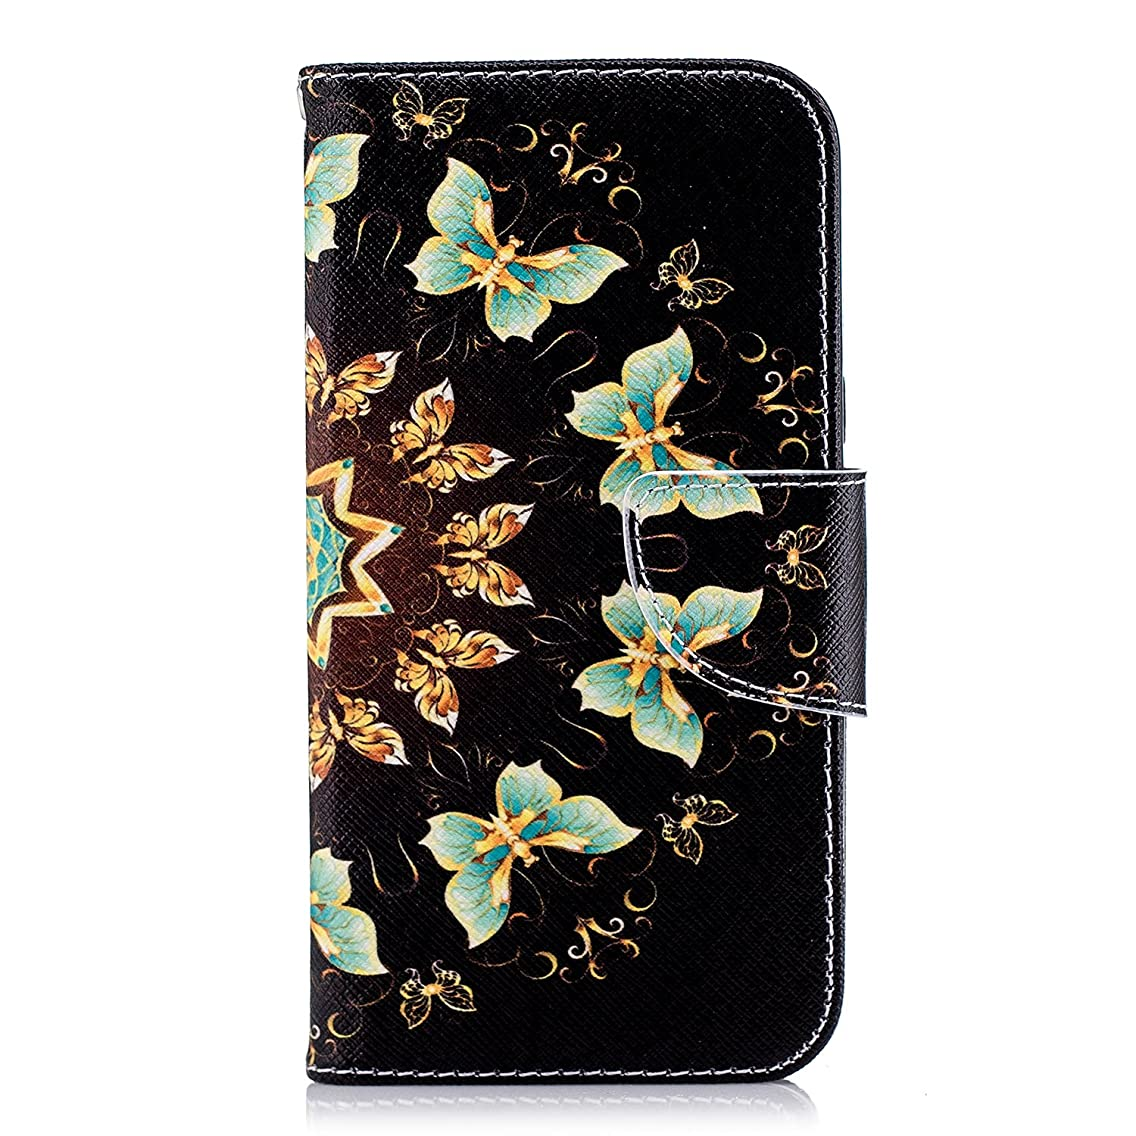 Samsung Galaxy J2 Pro 2018/Grand Prime Pro/J2 2018 Case, Lomogo Leather Wallet Case with Kickstand Card Holder Shockproof Flip Case Cover for Galaxy J2 Pro 2018 - LOBFE11325#2